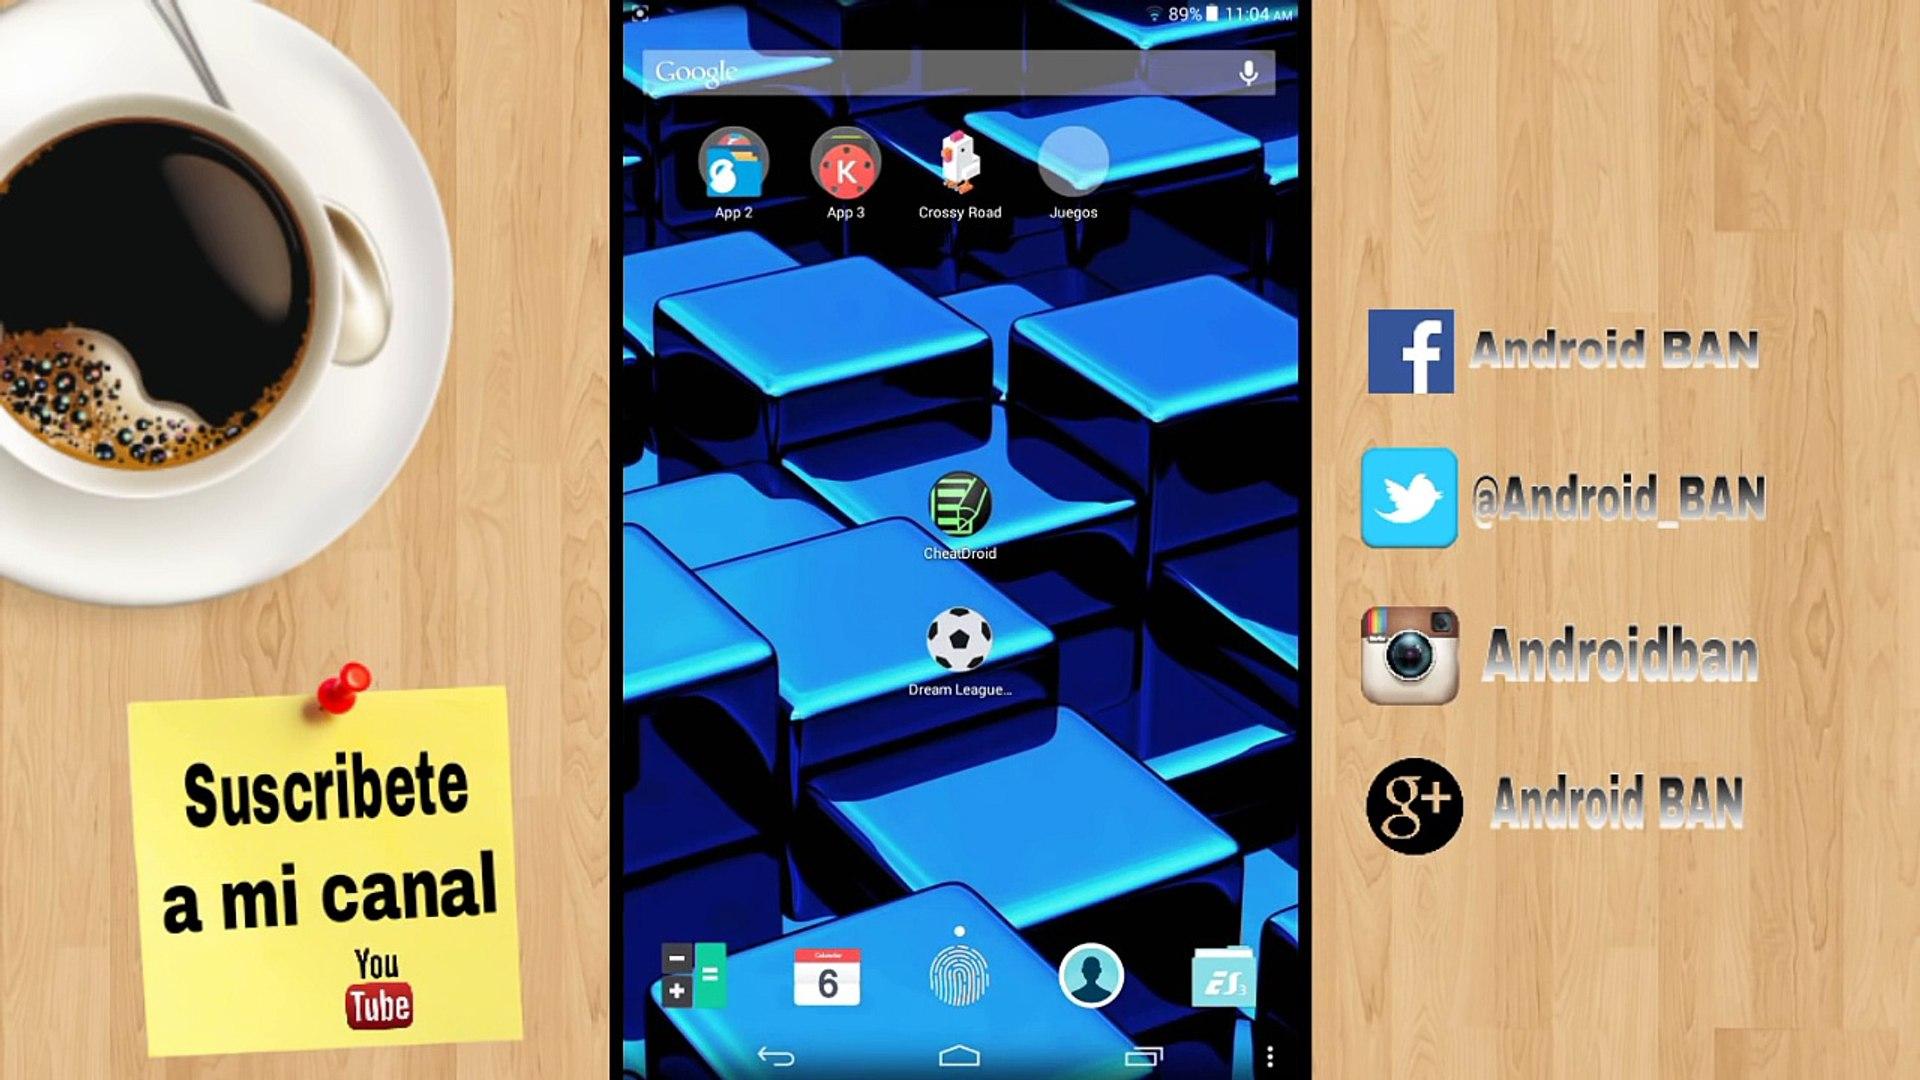 Dream League Soccer monedas infinitas sin root/root para android 2016 (DESCARGAR)